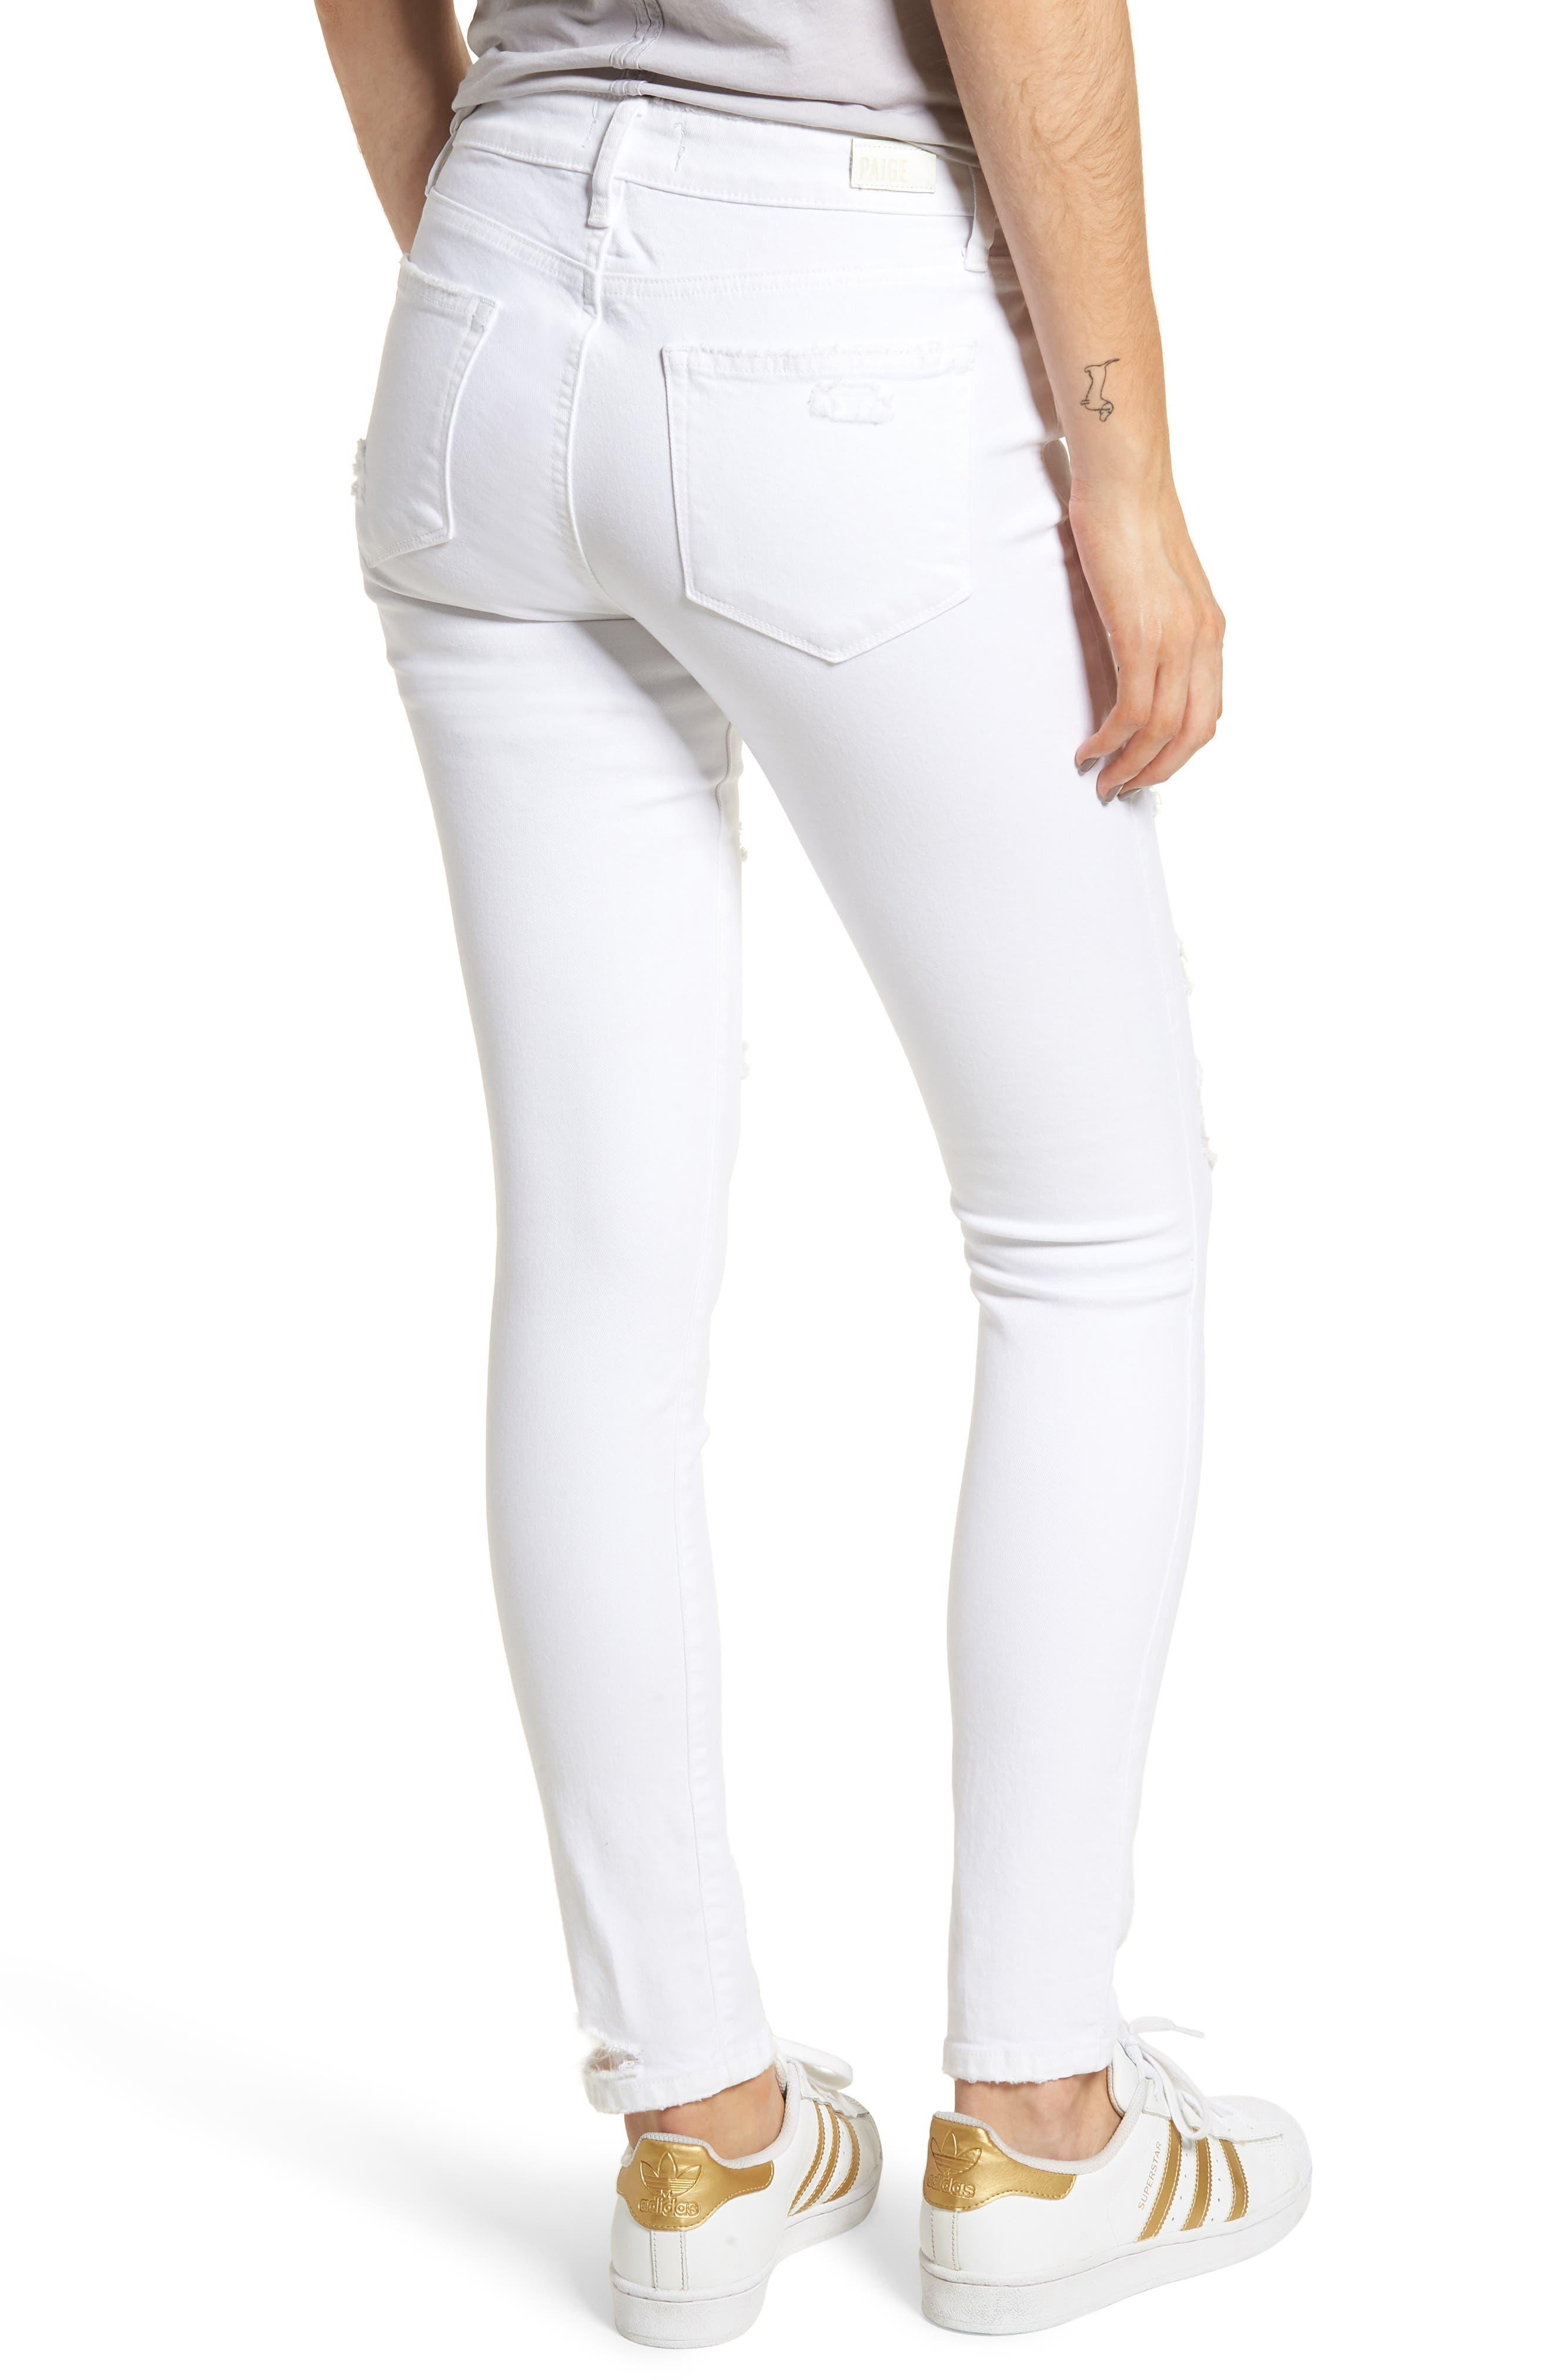 Verdugo Ripped Ultra Skinny Jeans,                             Alternate thumbnail 2, color,                             100